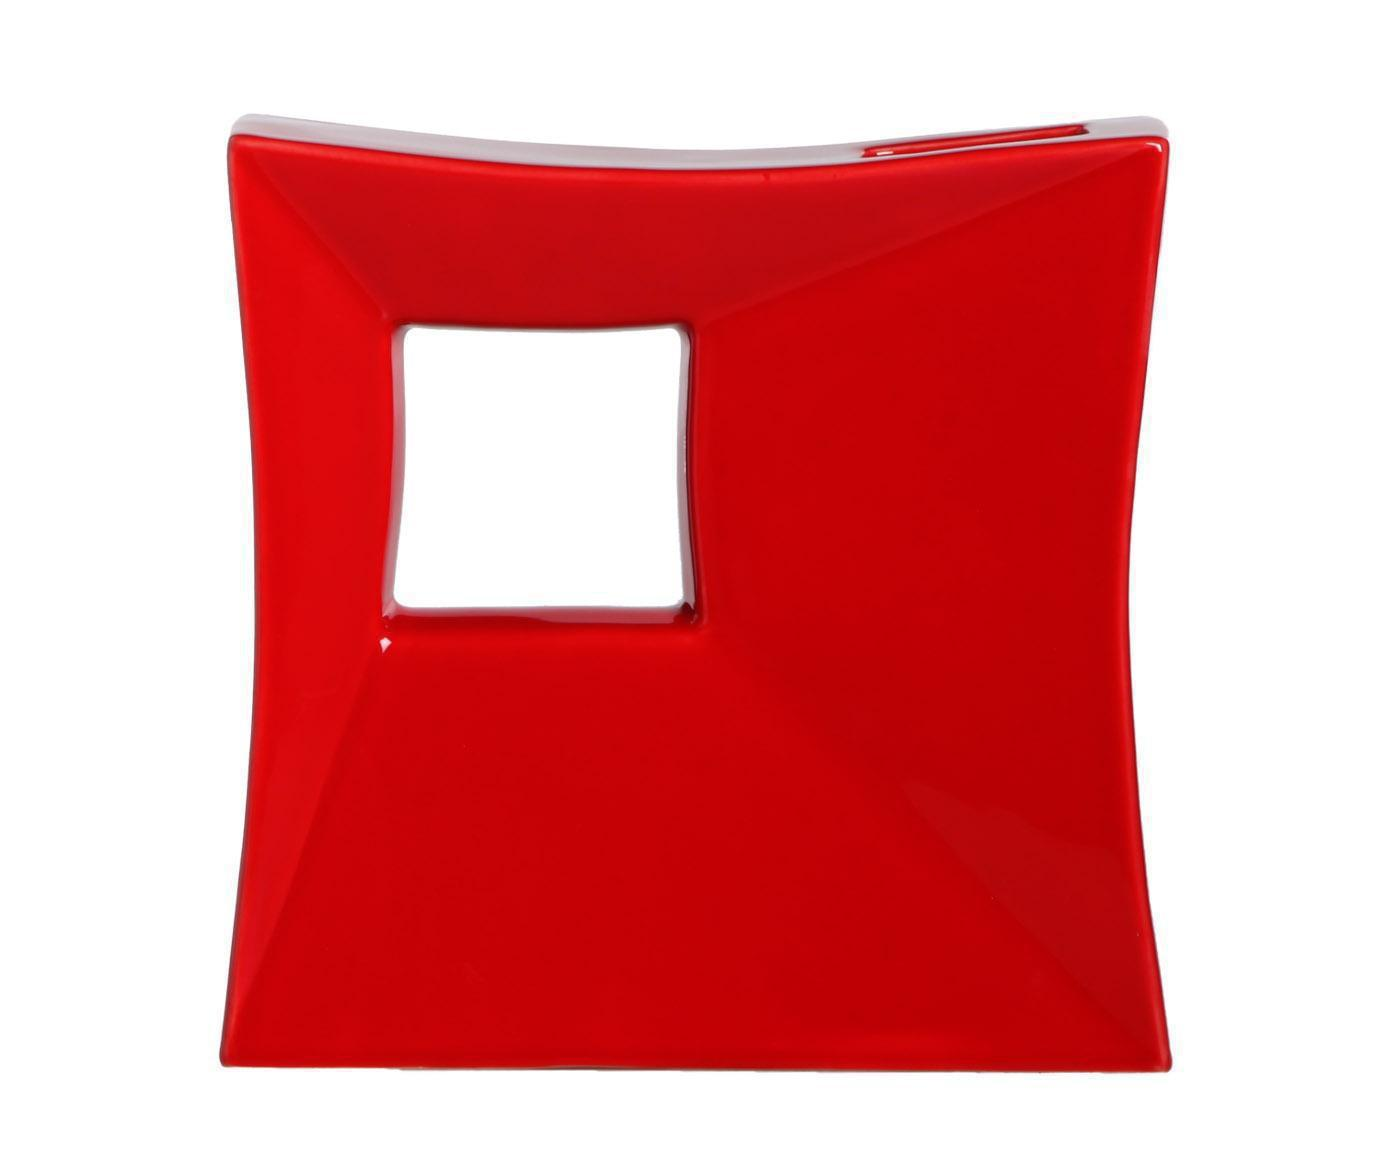 Вазы настольные Элитная ваза декоративная красная от Farol vaza-dekorativnaya-krasnaya-farol-portugaliya.jpg